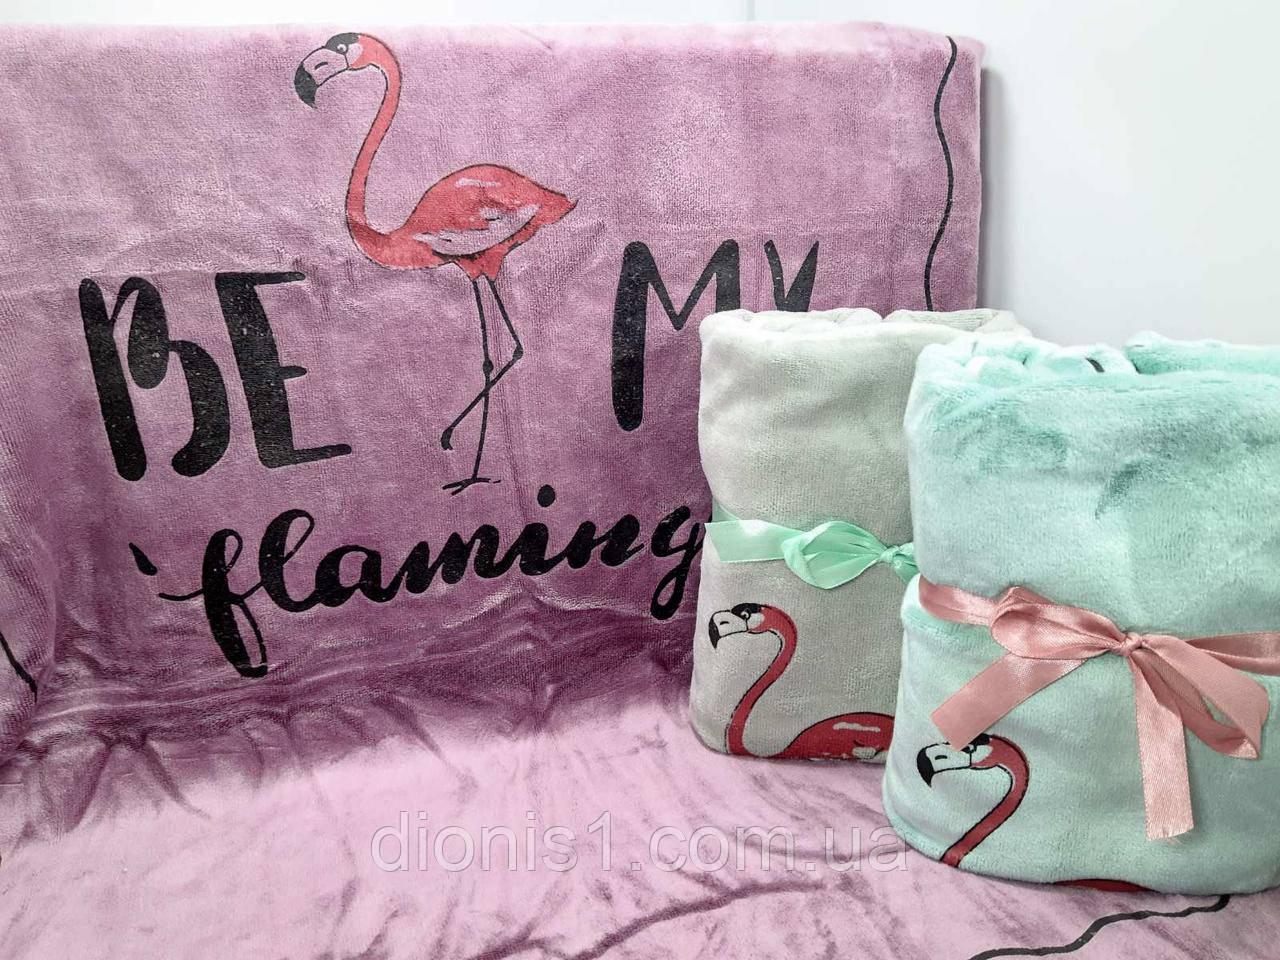 Полотенце лицевое фламинго фибра 3 шт в уп. размер 50*90